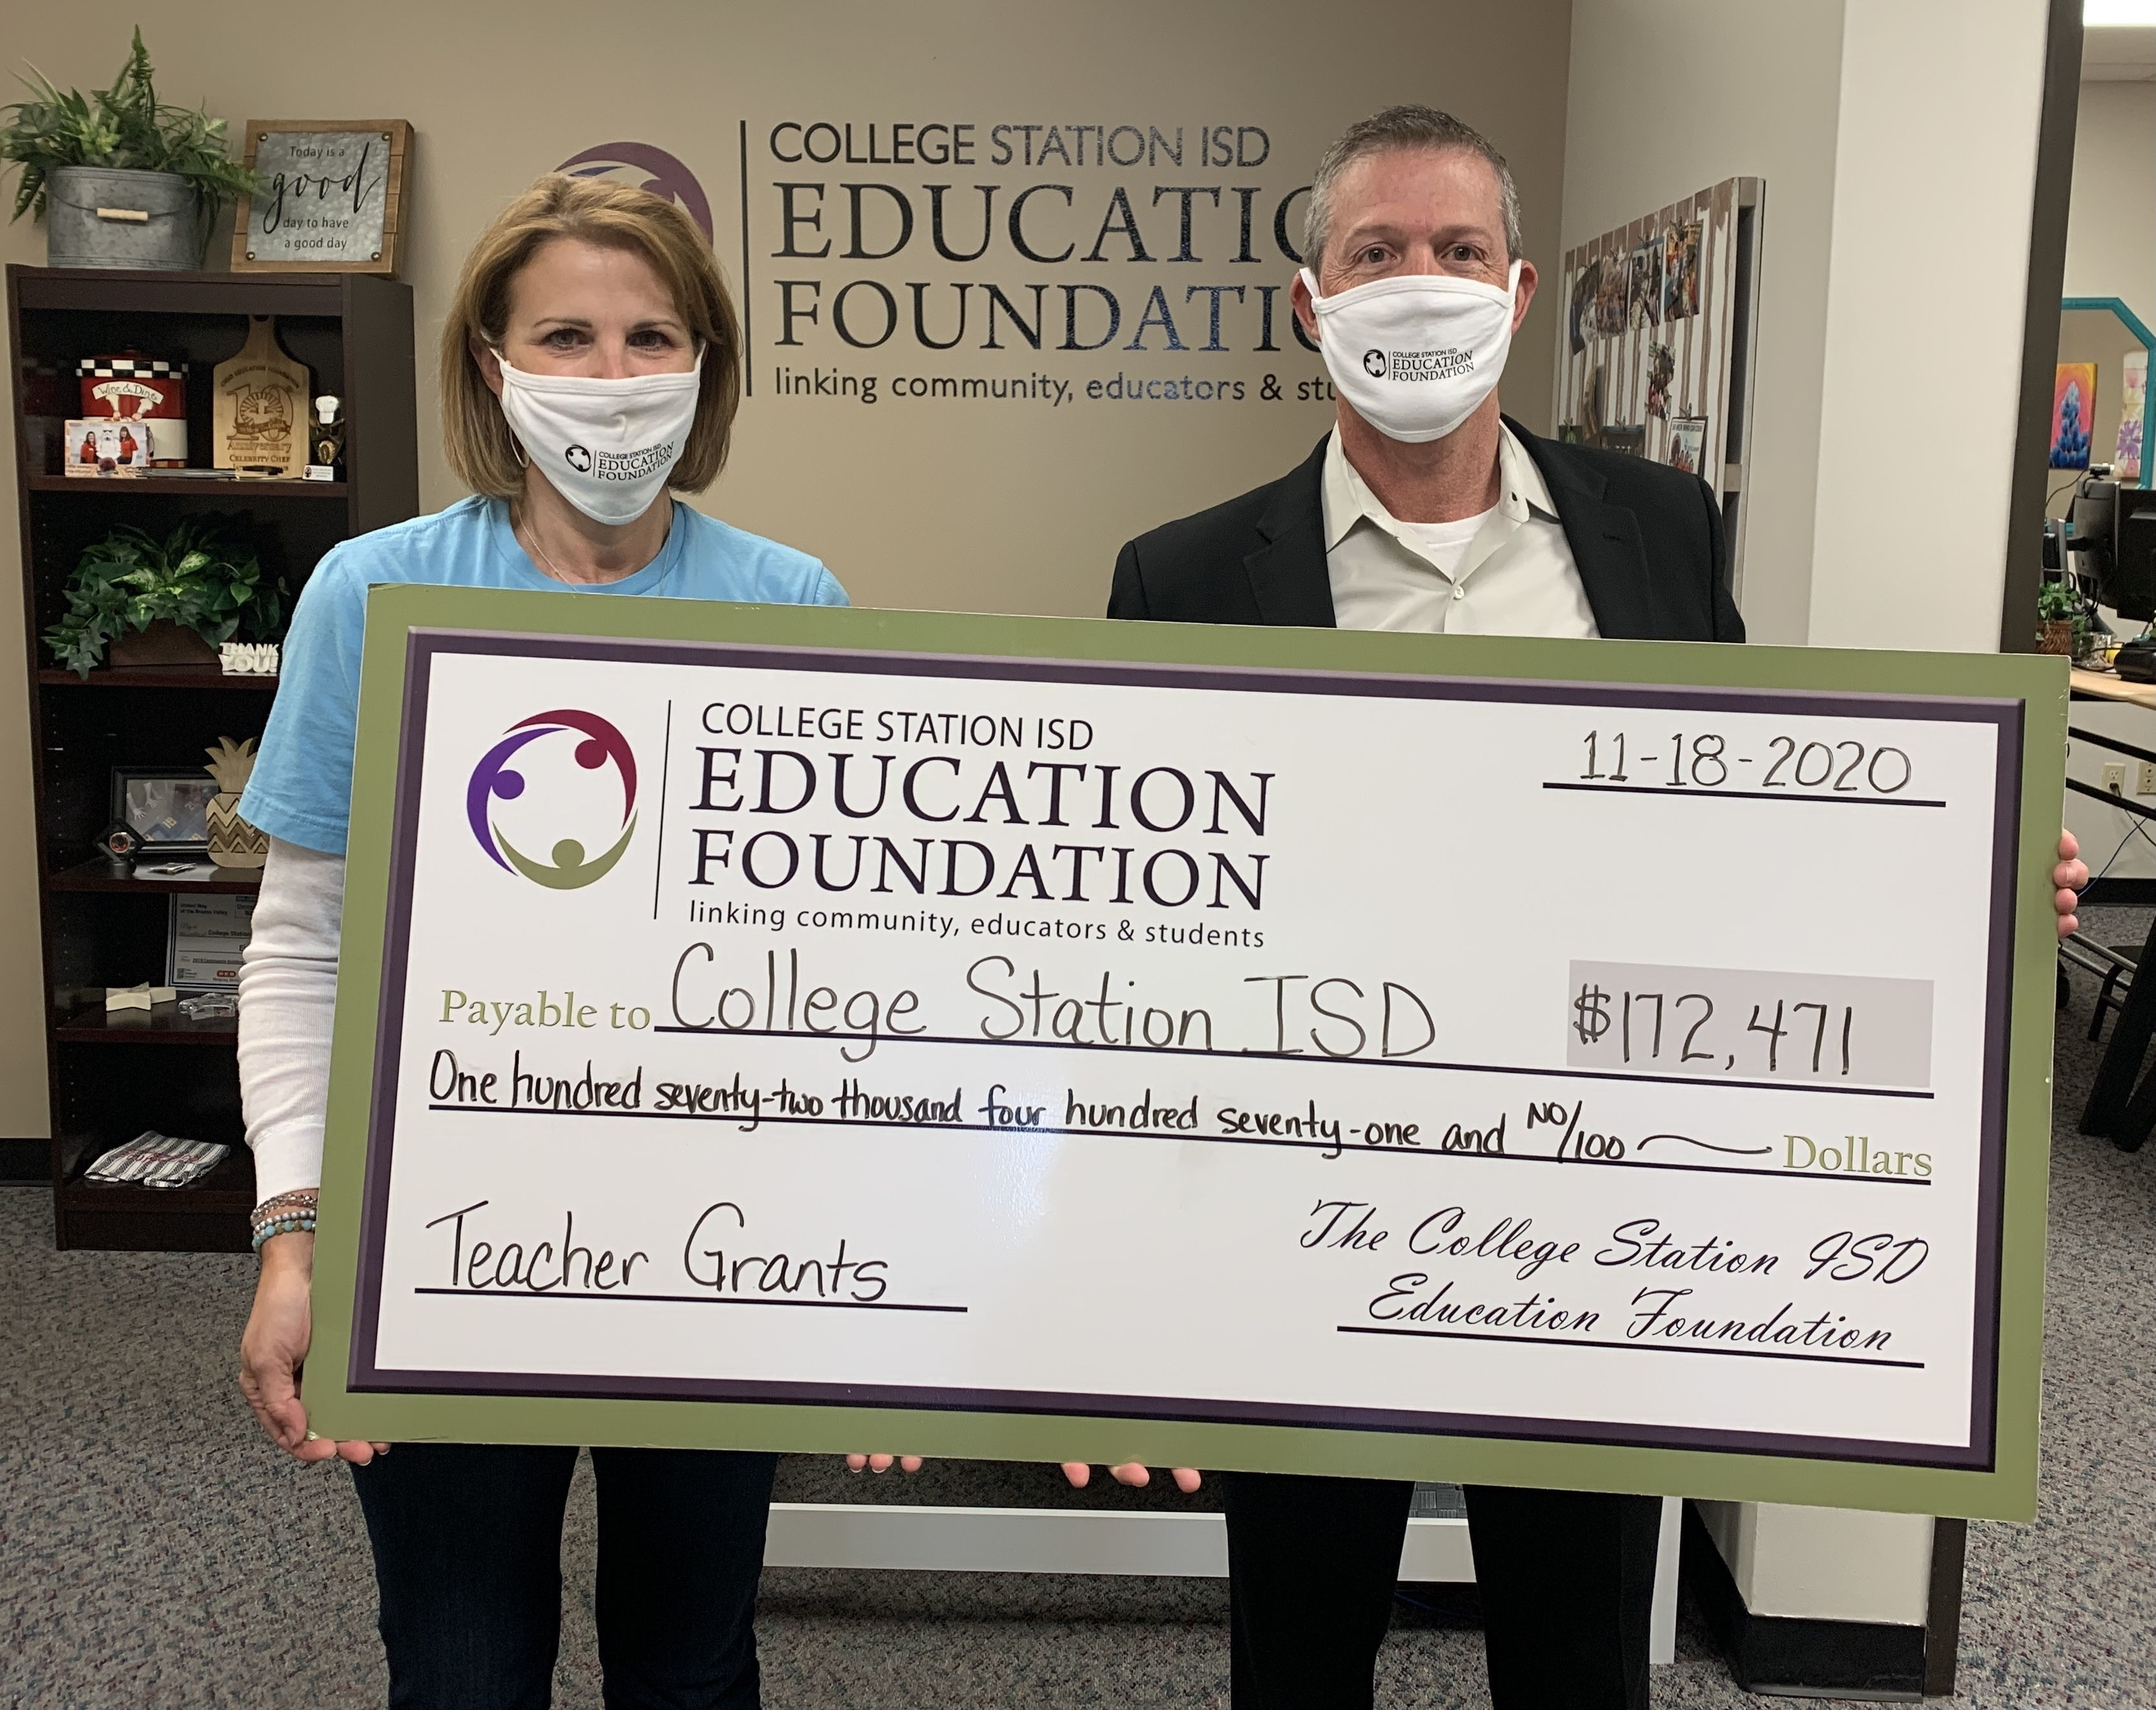 CSISD Education Foundation Awards $172,000 in Innovative Teaching Grants